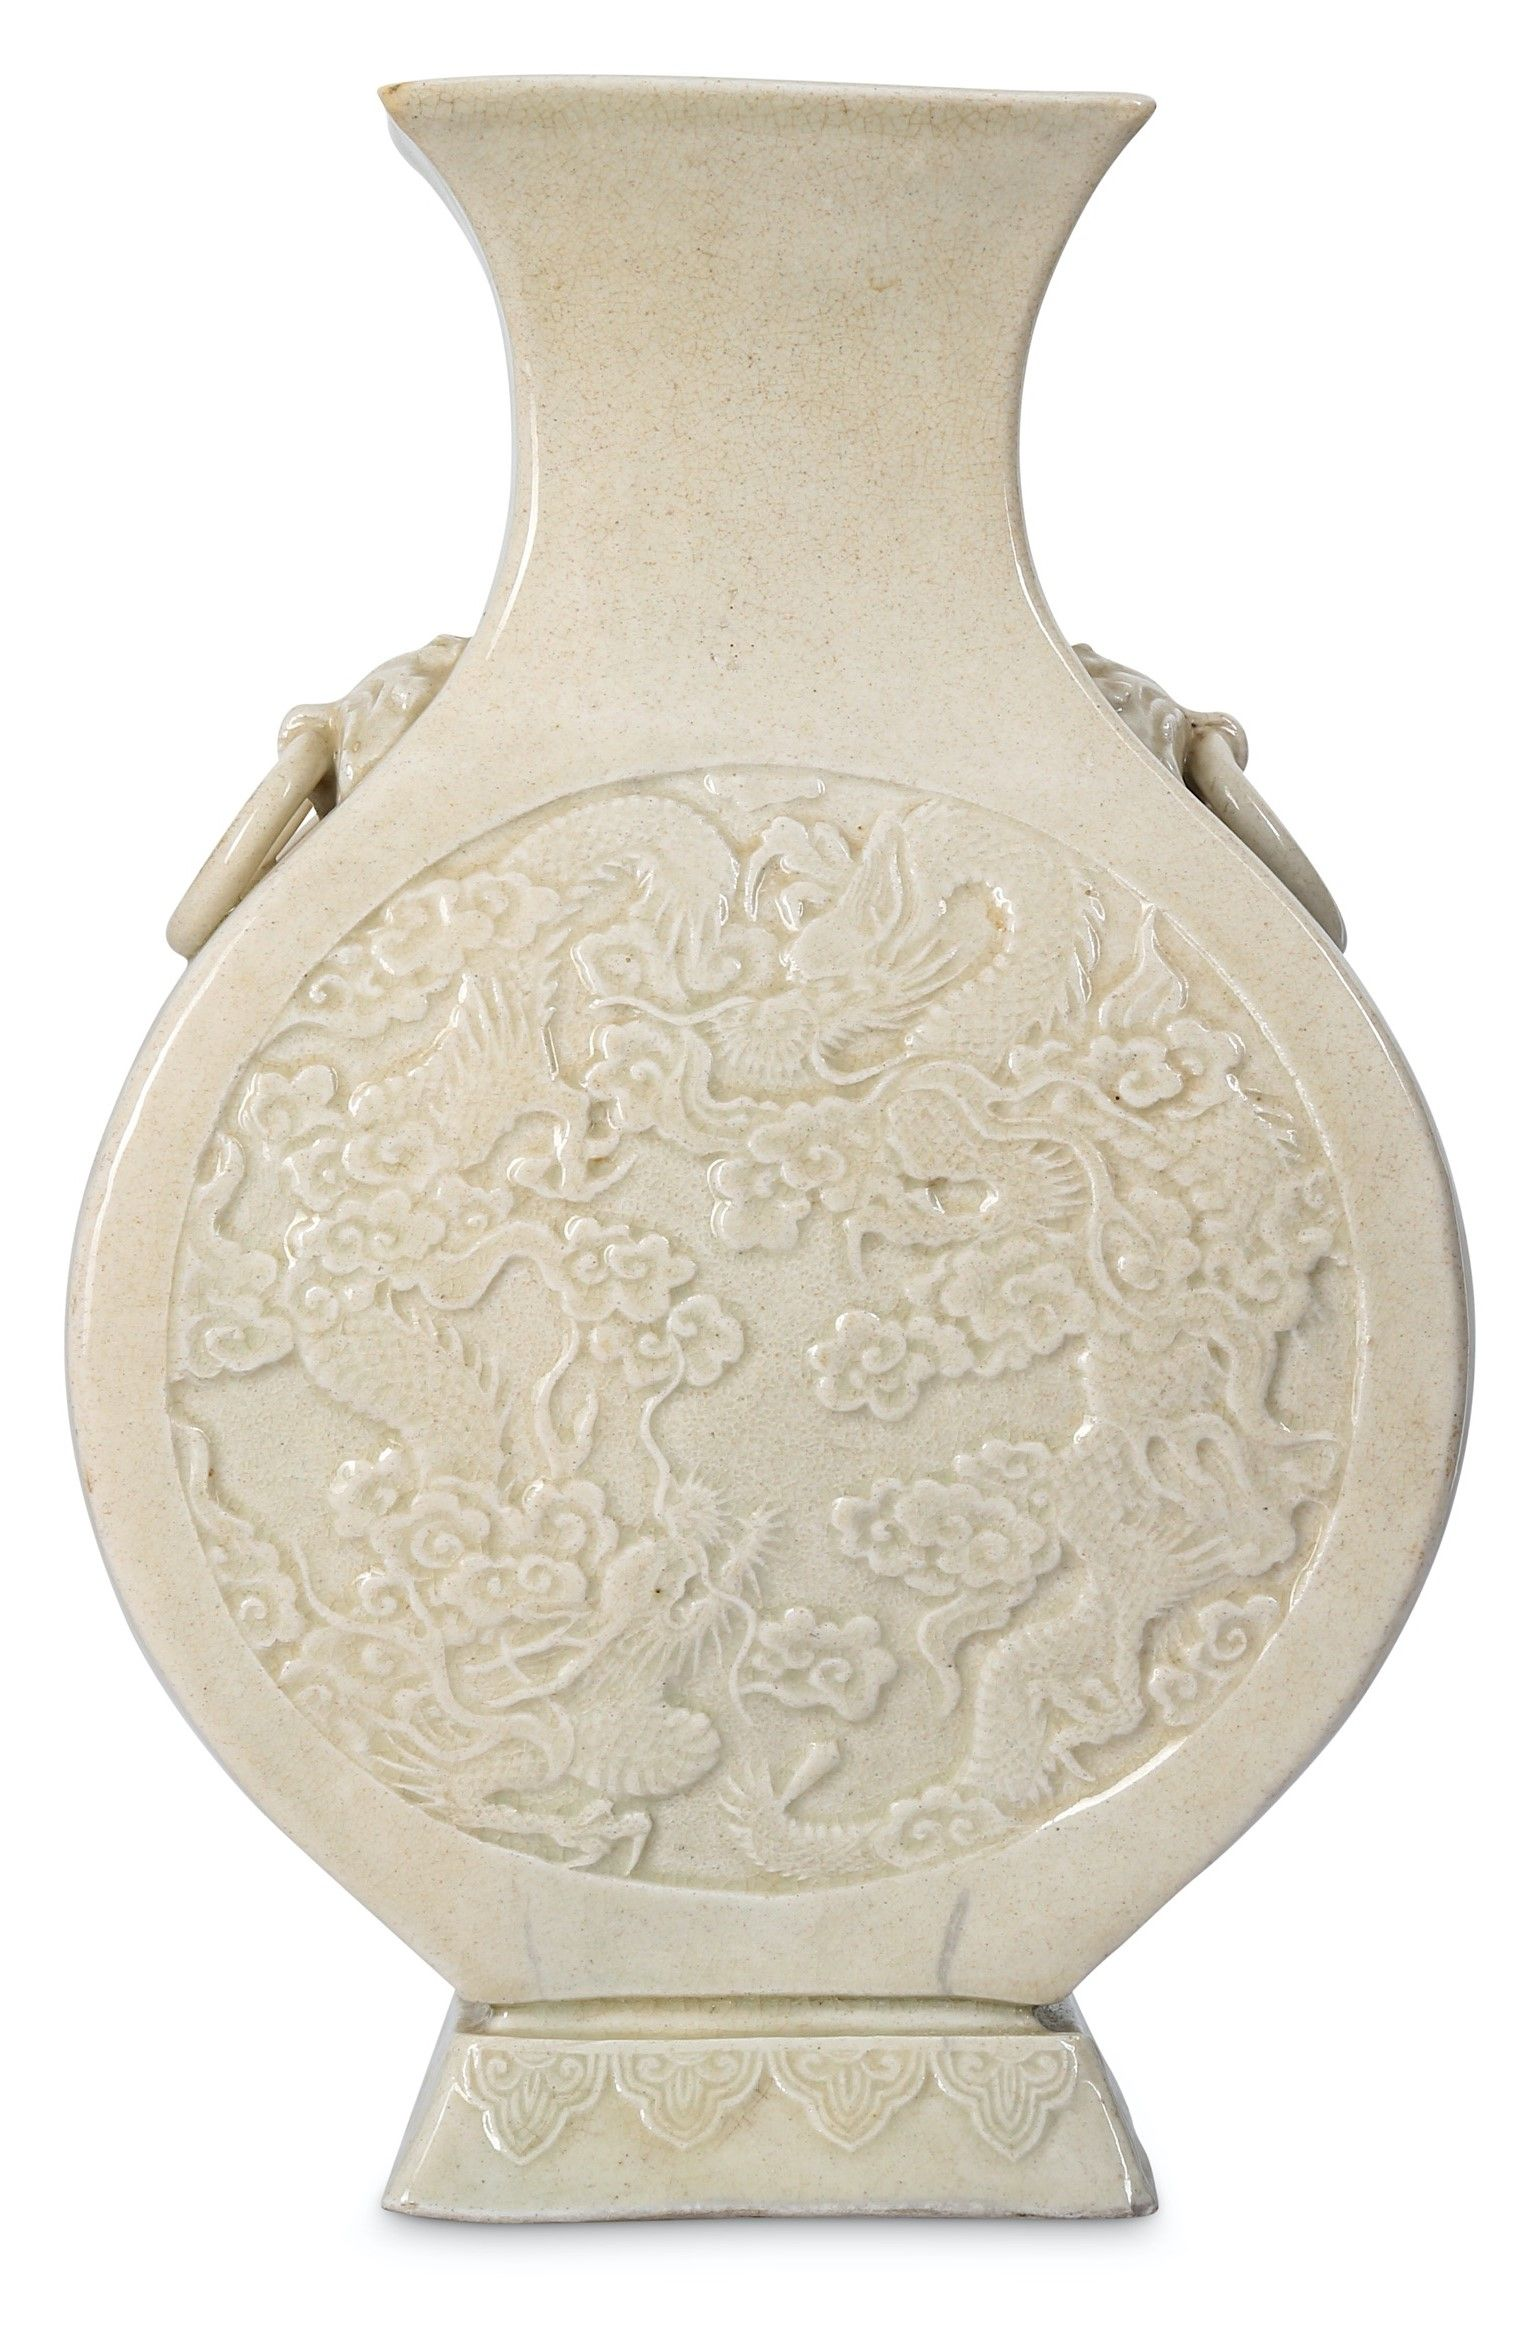 Cream-glazed Dragon Vase Hu | China - 19th Century | #dragon #dragons #art #antique #ceramic #ware #Jingdezhen #stoneware #porcelain #pottery #auction #history #poterie #céramique #sculpture #celadon #antiquité #brocante #stoneware #museum #sancai #nankin #dynasty #tang #ming #song #tong #yuan #Qianlong #qing #Cizhou #meiping #imperial #period #chine #drachen #drache #drago #Japan #meiji #satsuma #Shenlong #Tianlong #Qiulong #Panlong #longshan #ryū #龍 #竜 #龙